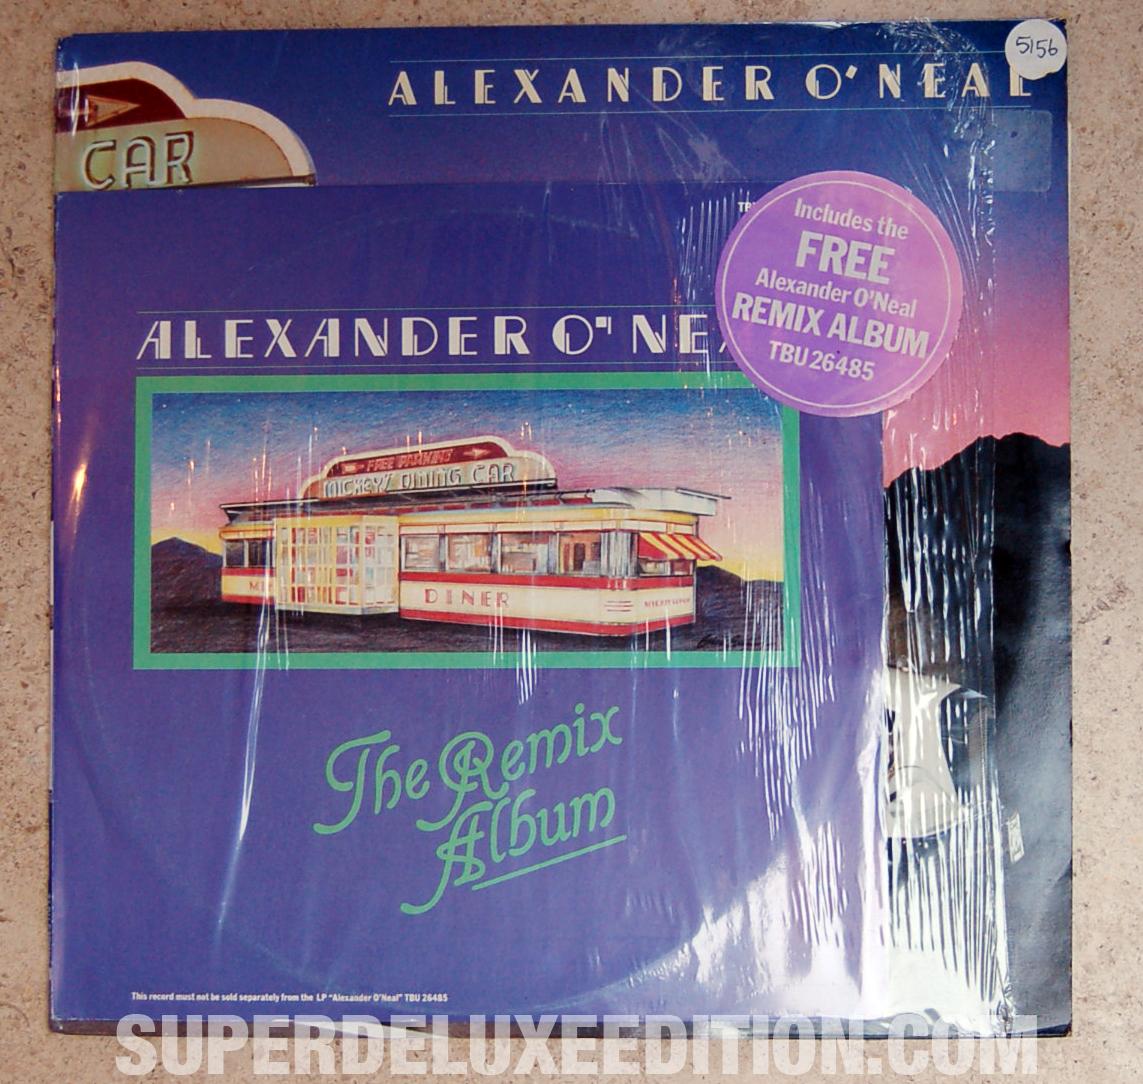 Original Alexander O'Neal LP with bonus remix album